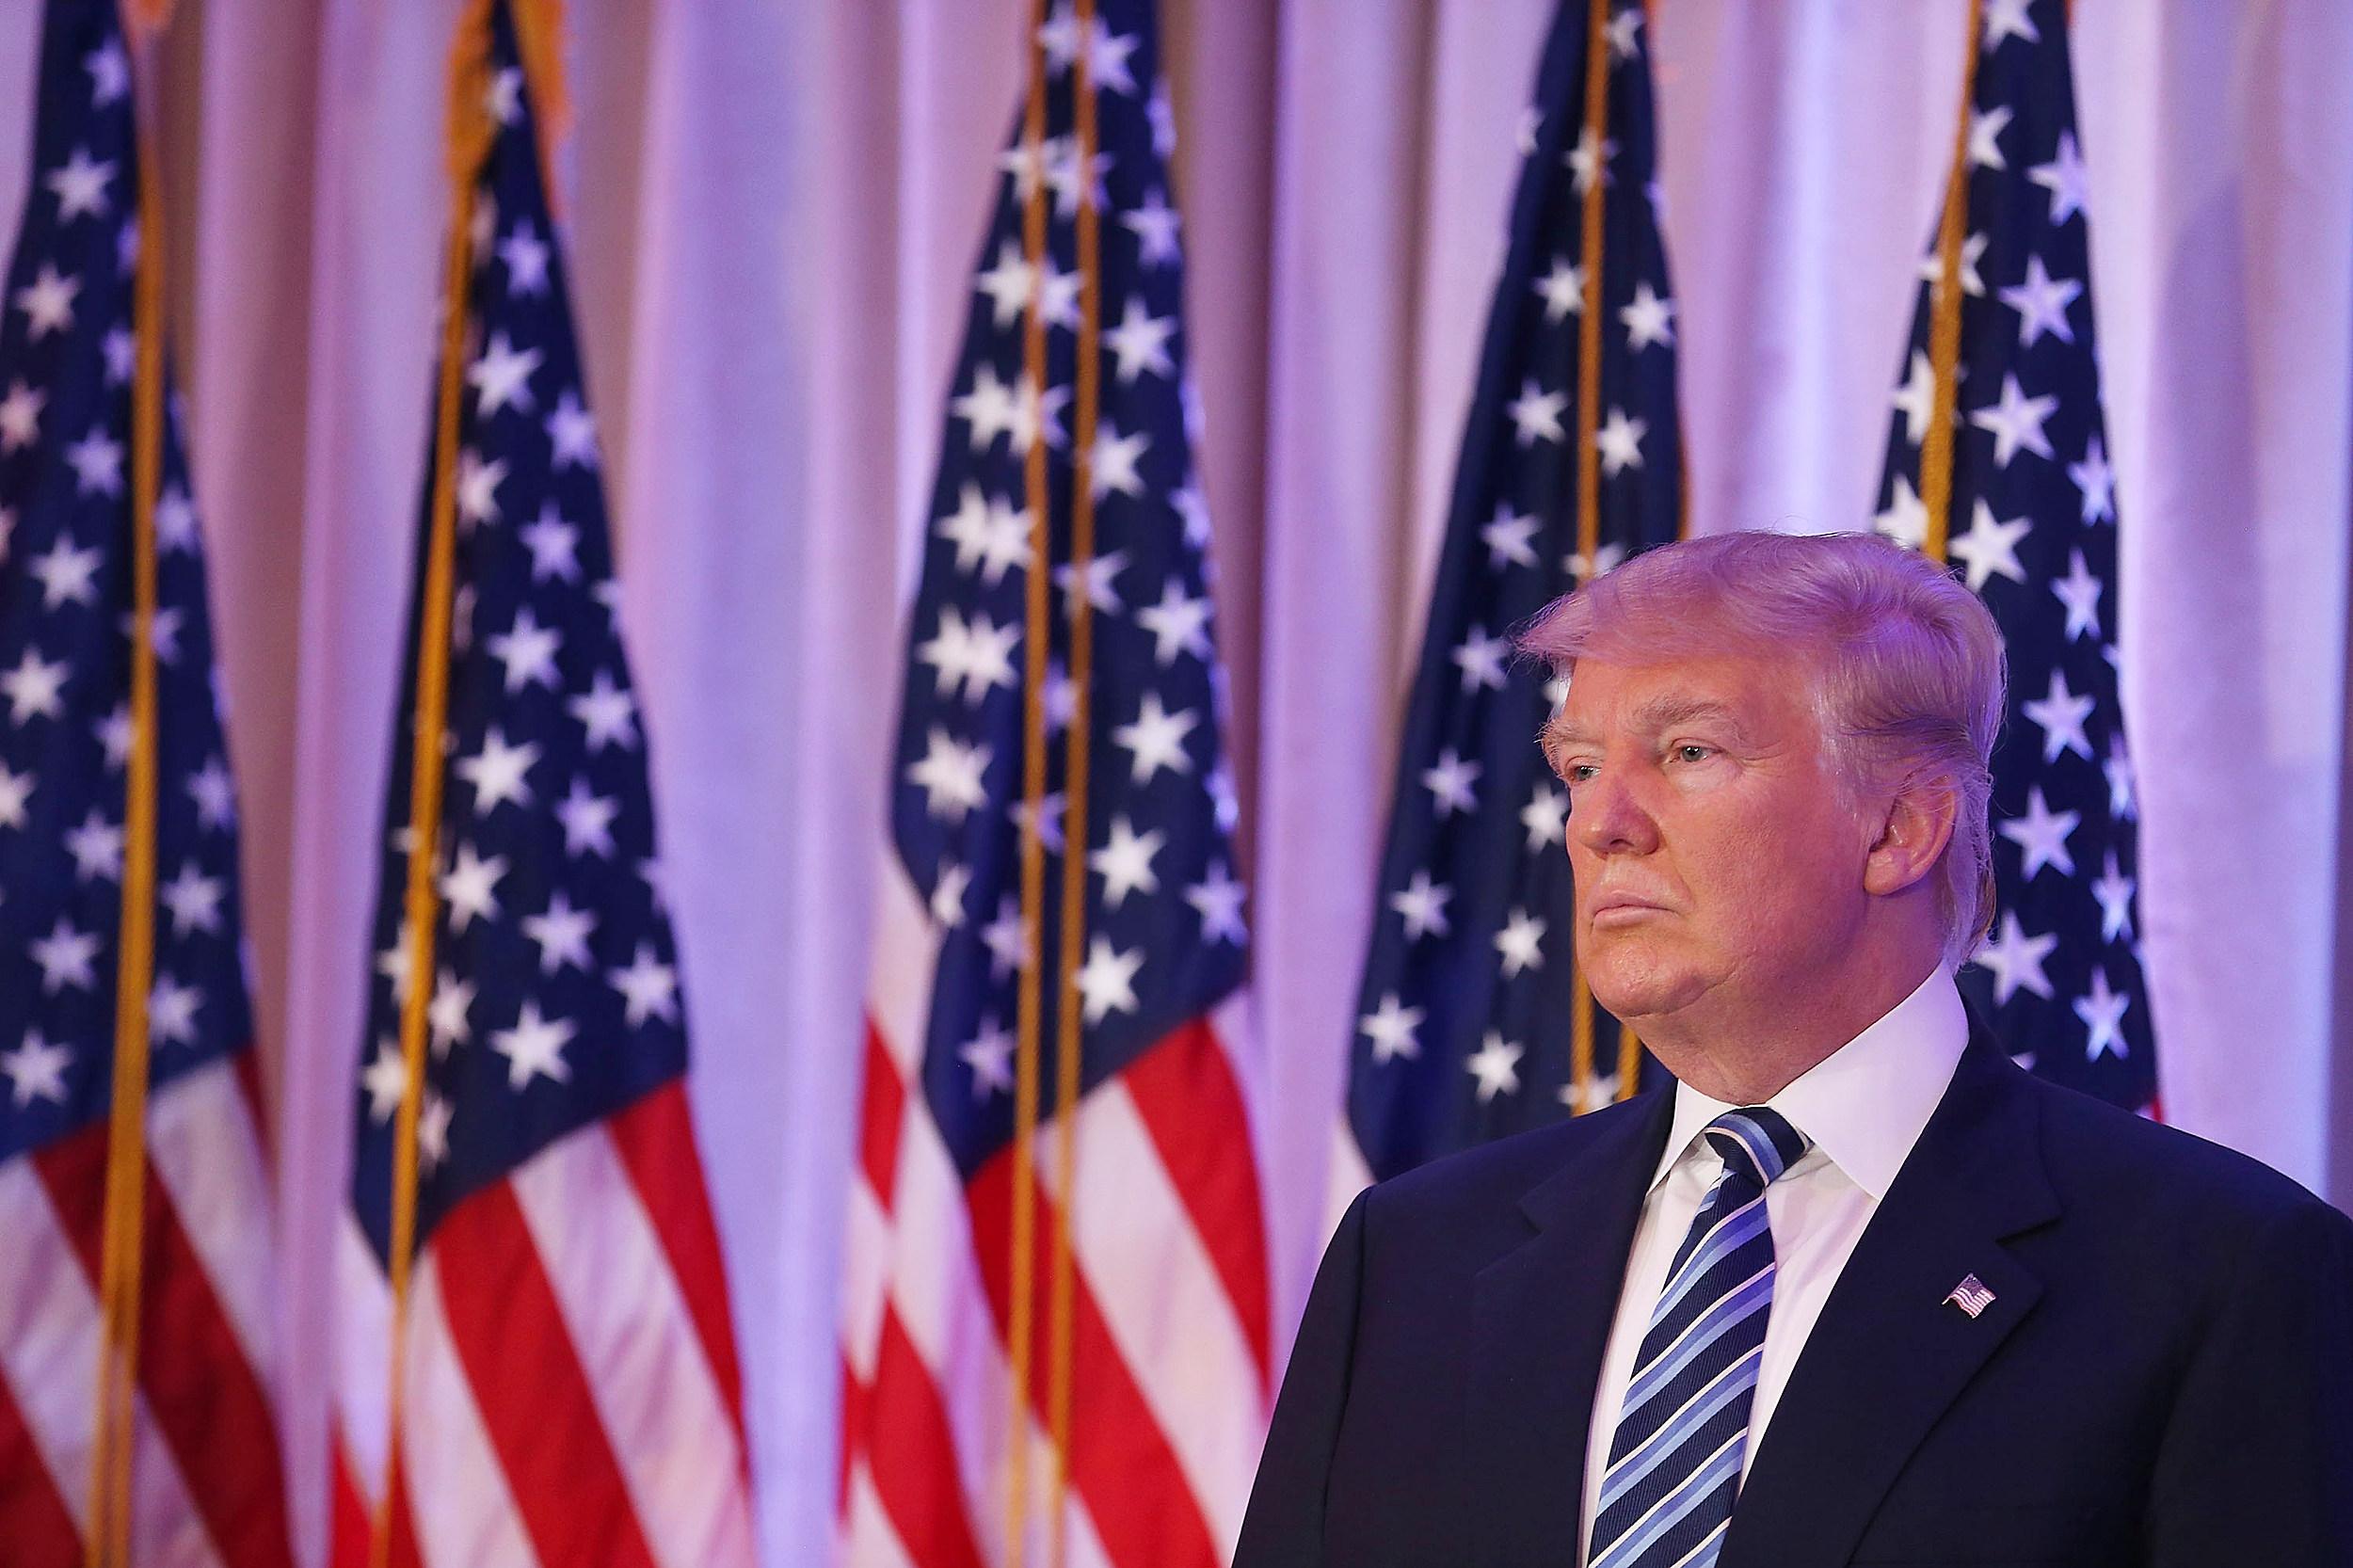 Trump calls off rally amid protests, scuffles